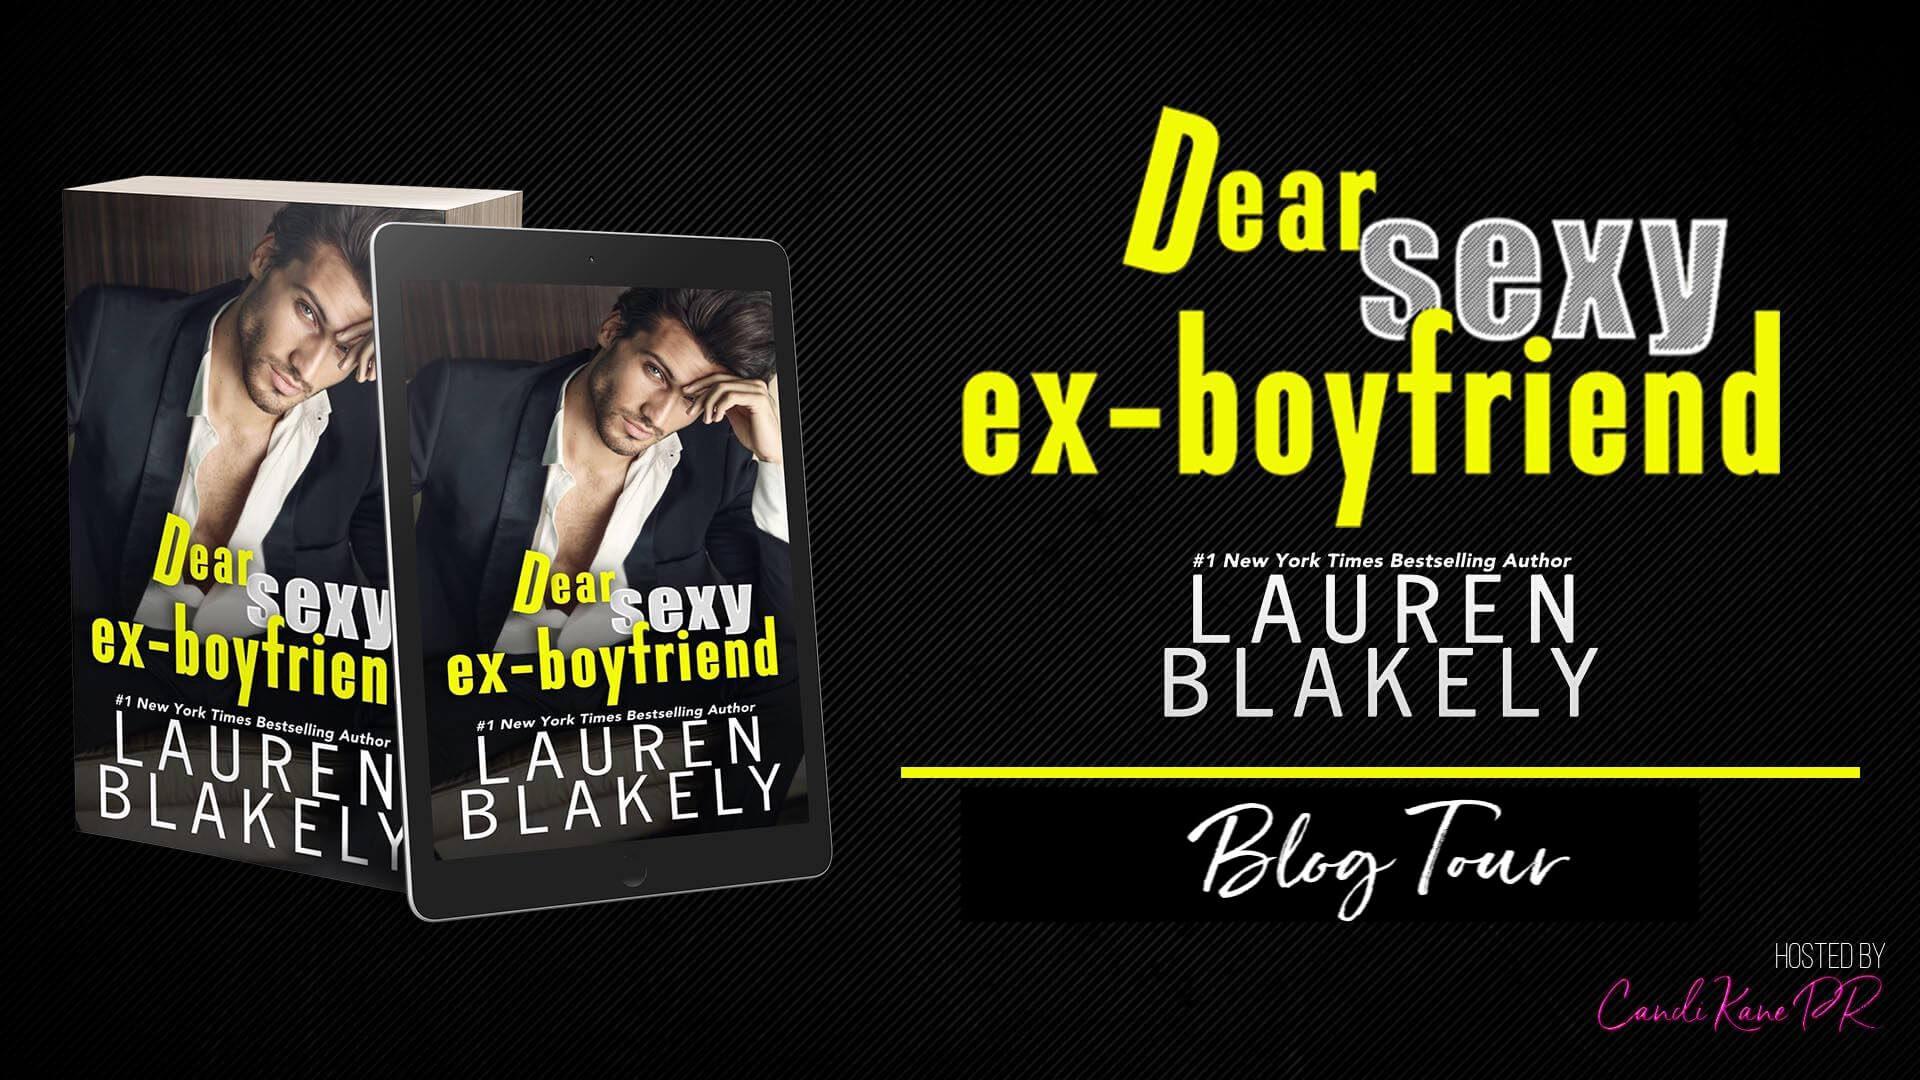 Blog Tour Review: Dear Sexy Ex-Boyfriend (The Guys Who Got Away #1) by Lauren Blakely